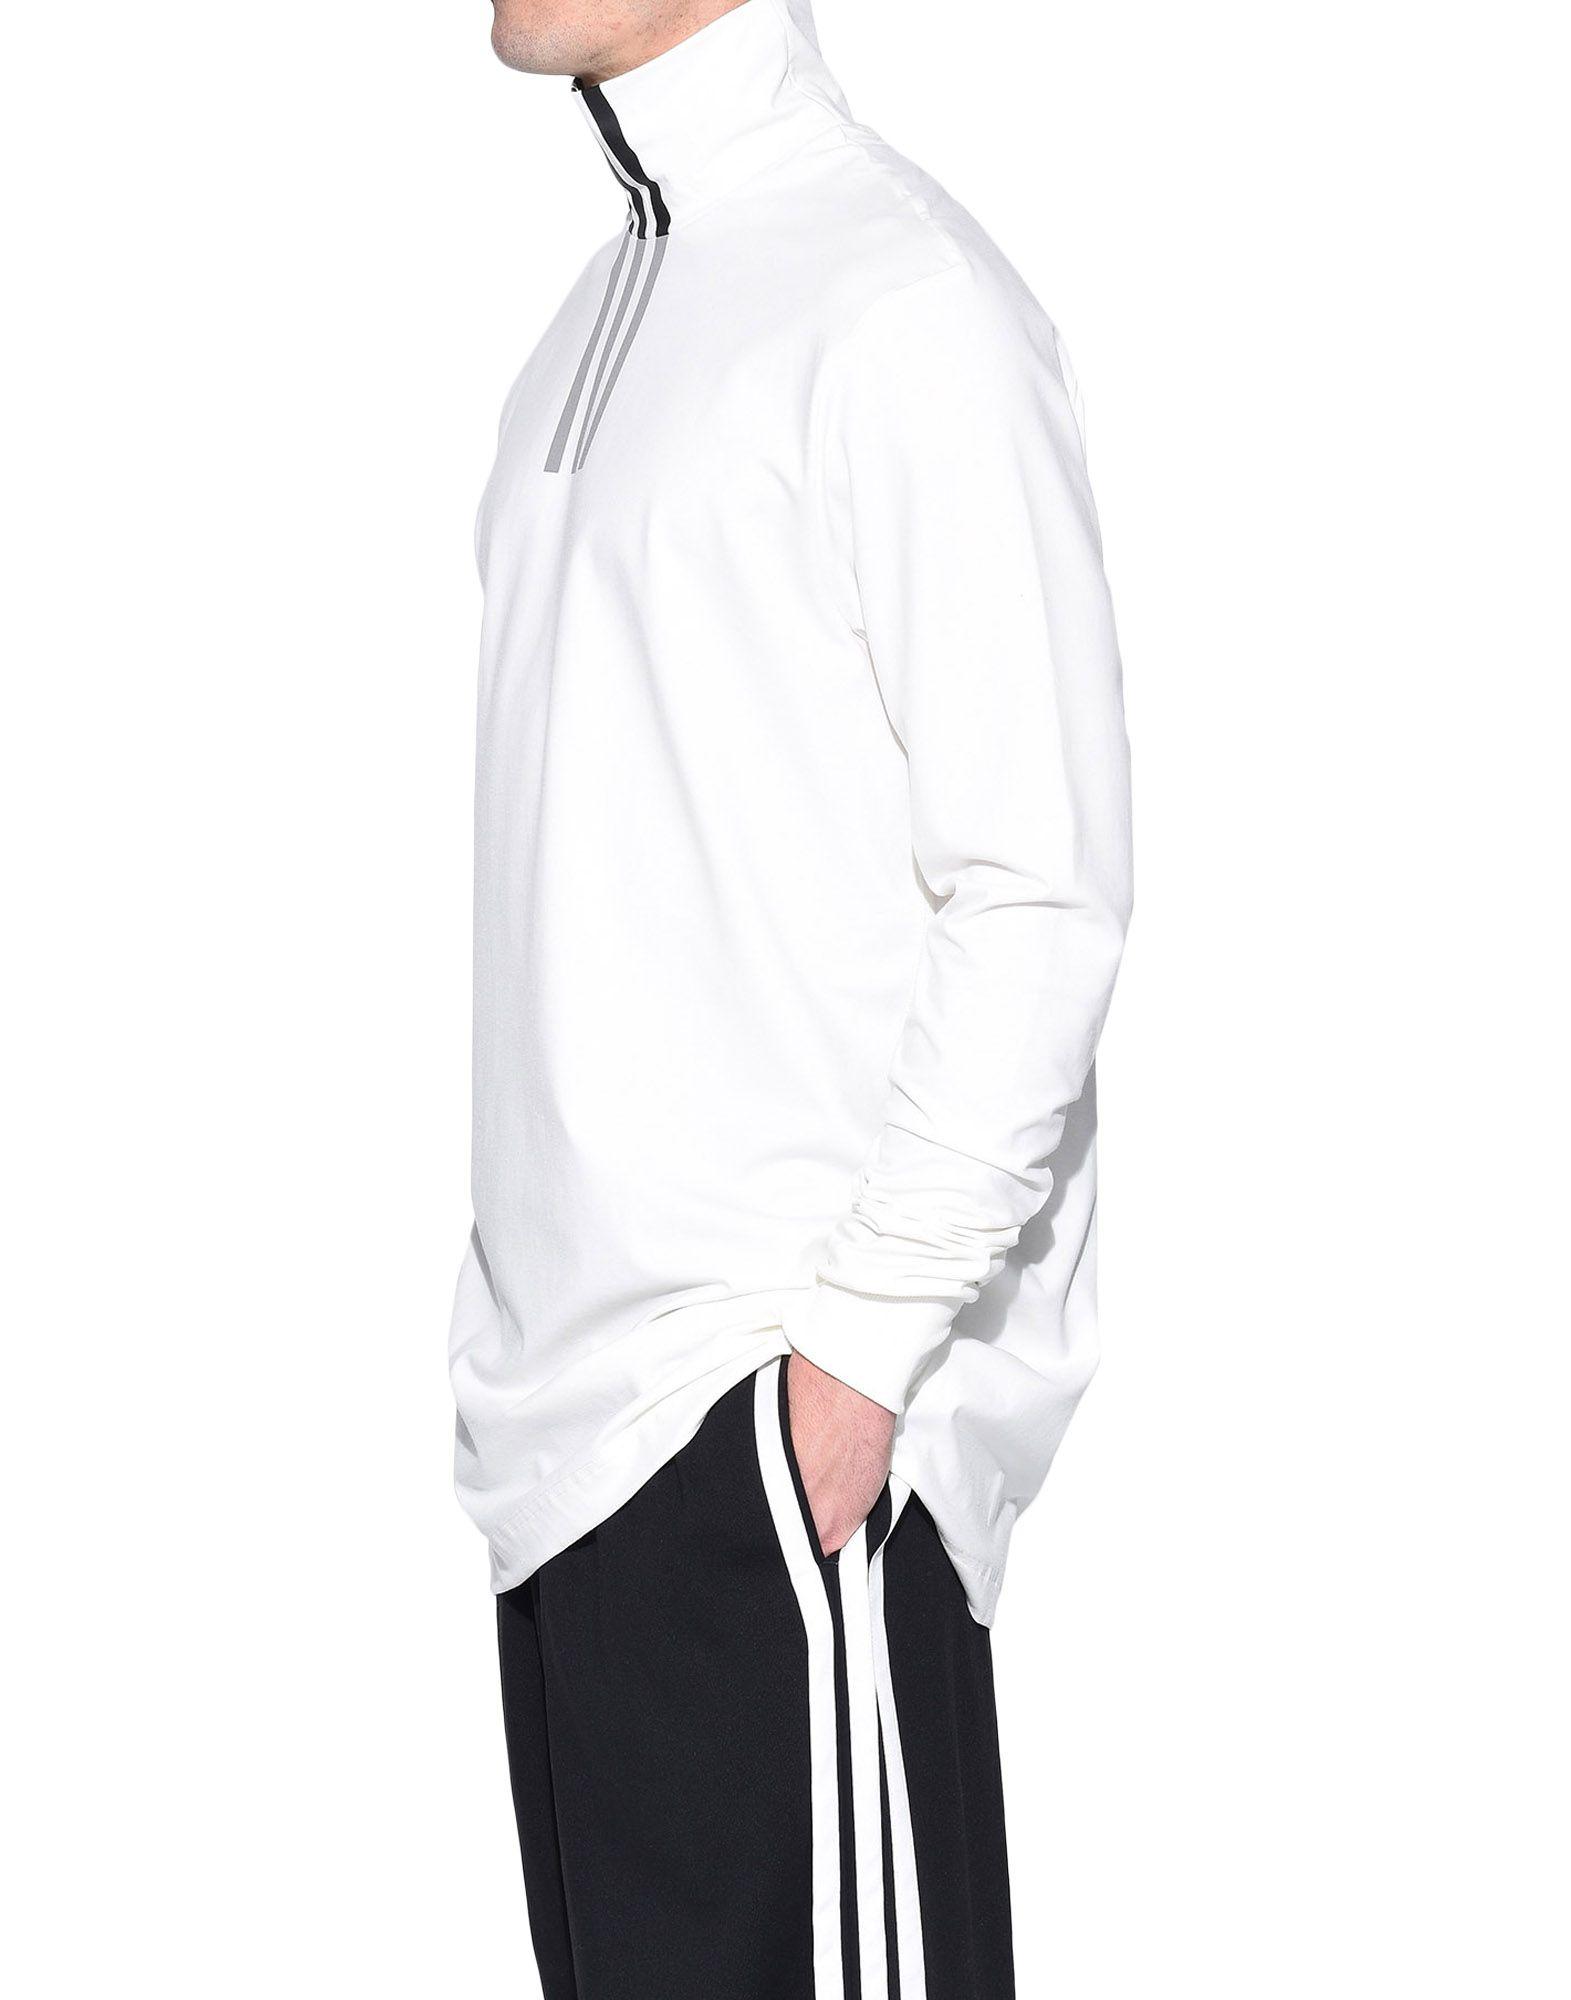 Y-3 Y-3 3-Stripes High Neck Tee Long sleeve t-shirt Man e